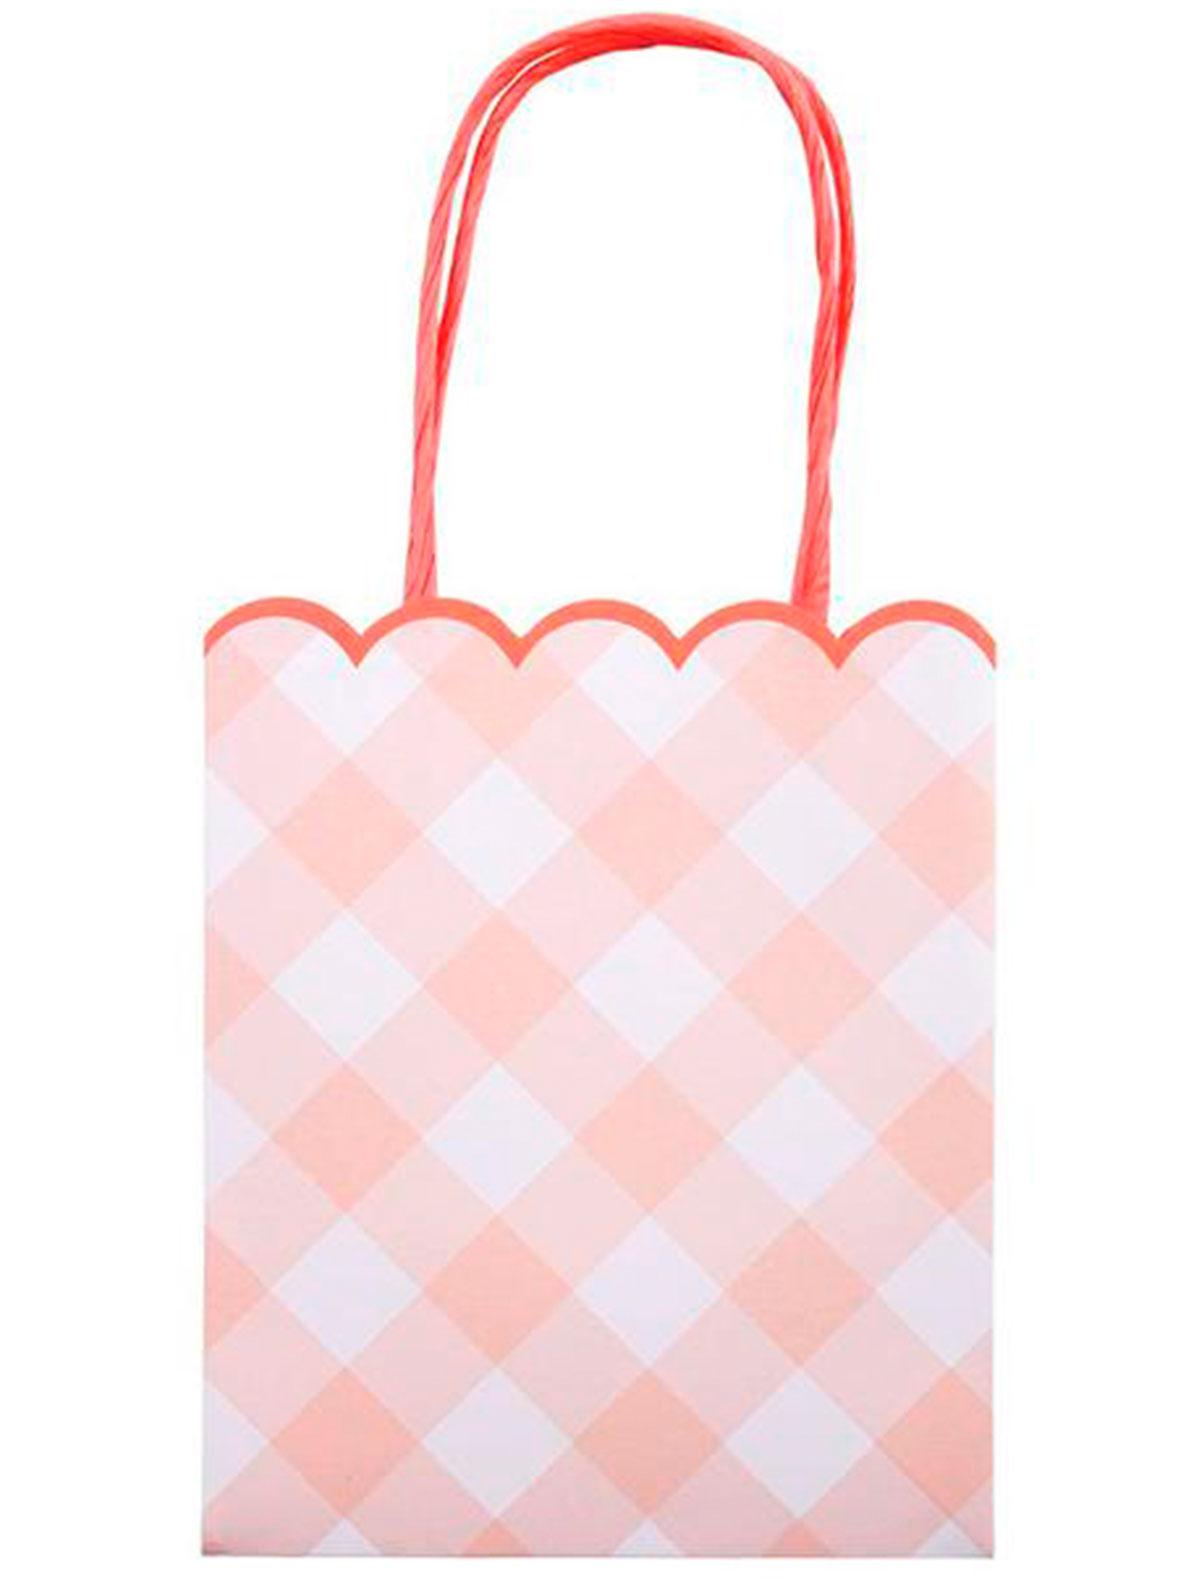 Подарочная упаковка Meri Meri, Розовый, 2221329